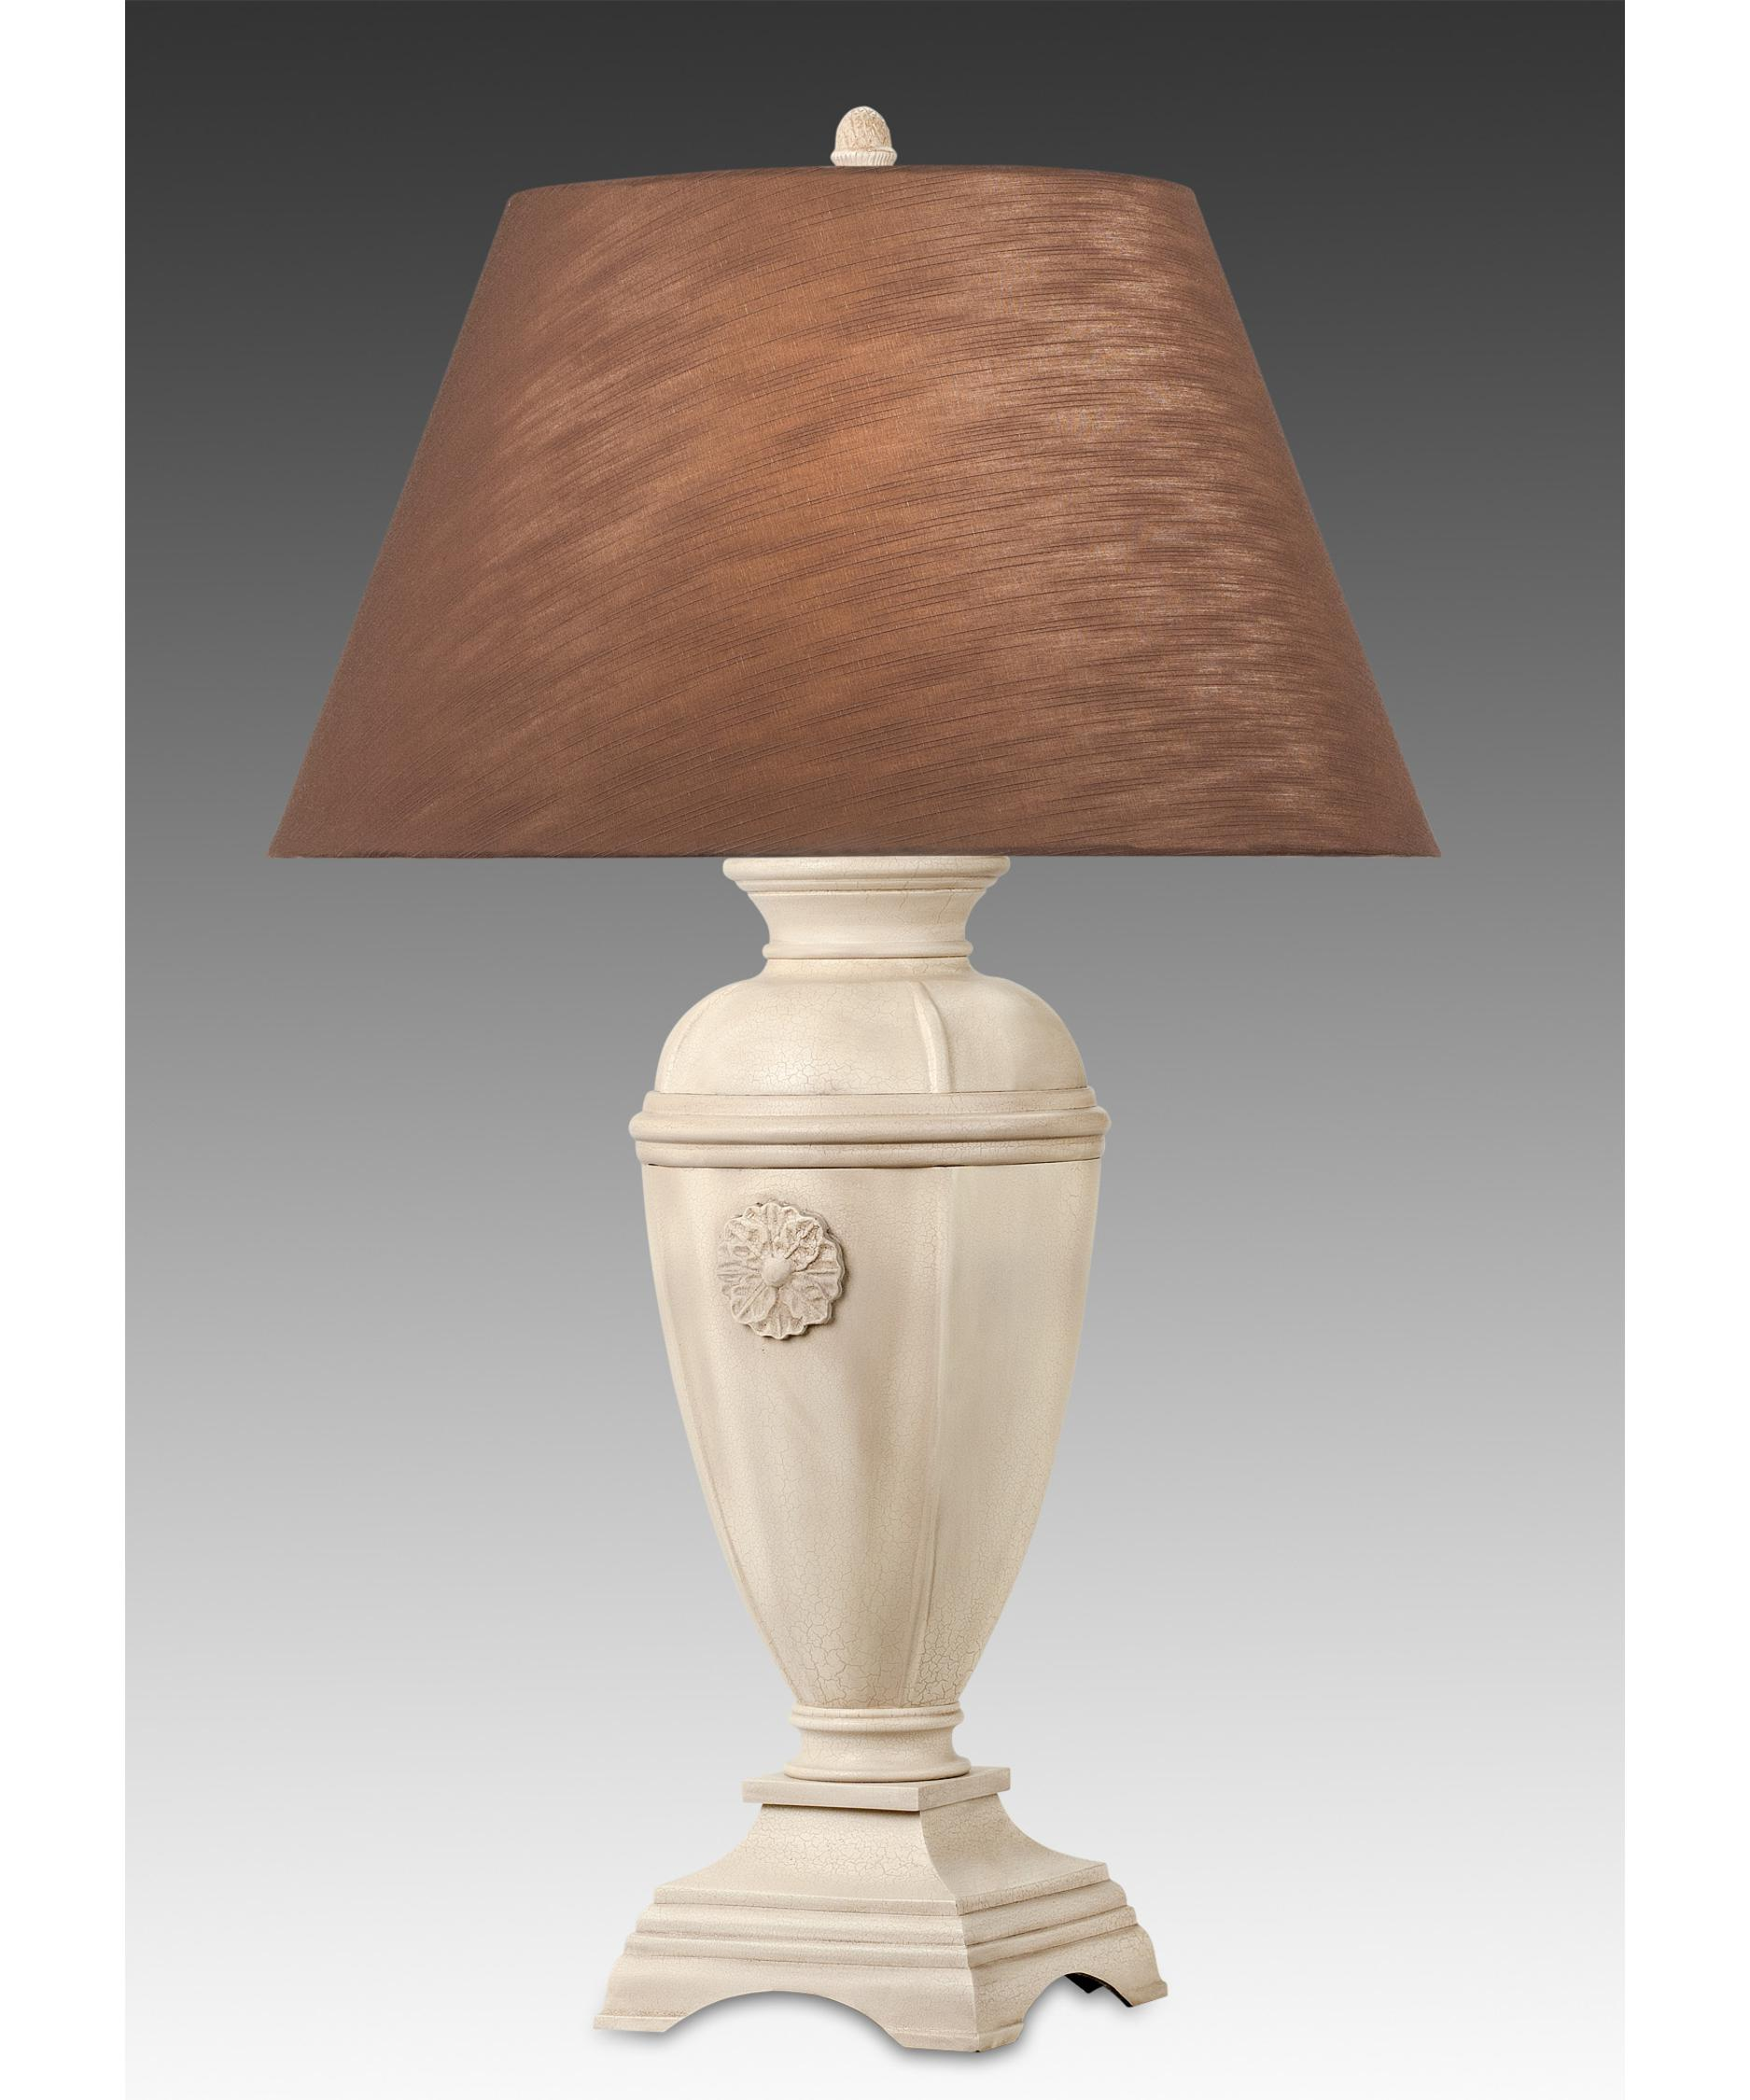 Remington Lamp 2299 Table Lamp Capitol Lighting 1